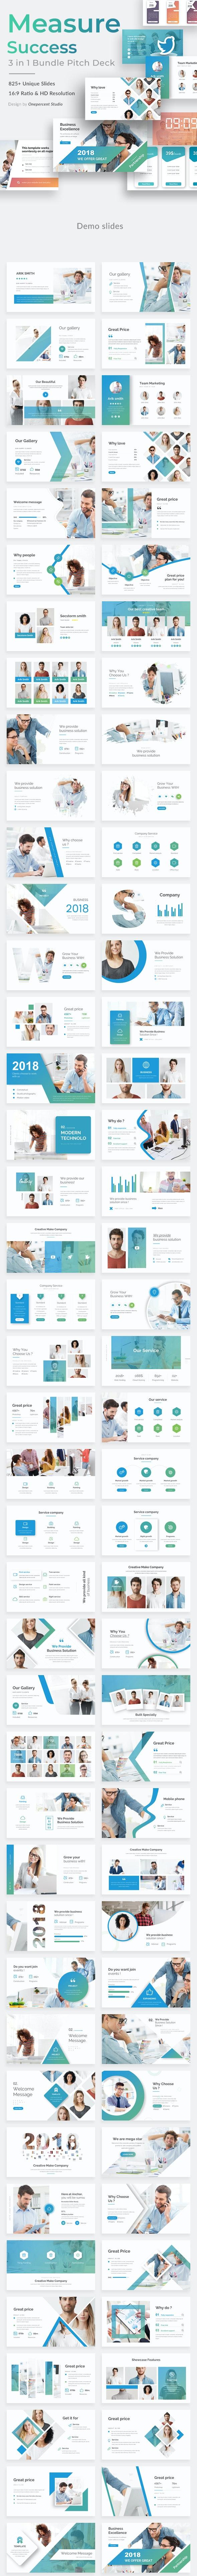 Measure Success 3 in 1 Pitch Deck Bundle Powerpoint Template - Business PowerPoint Templates